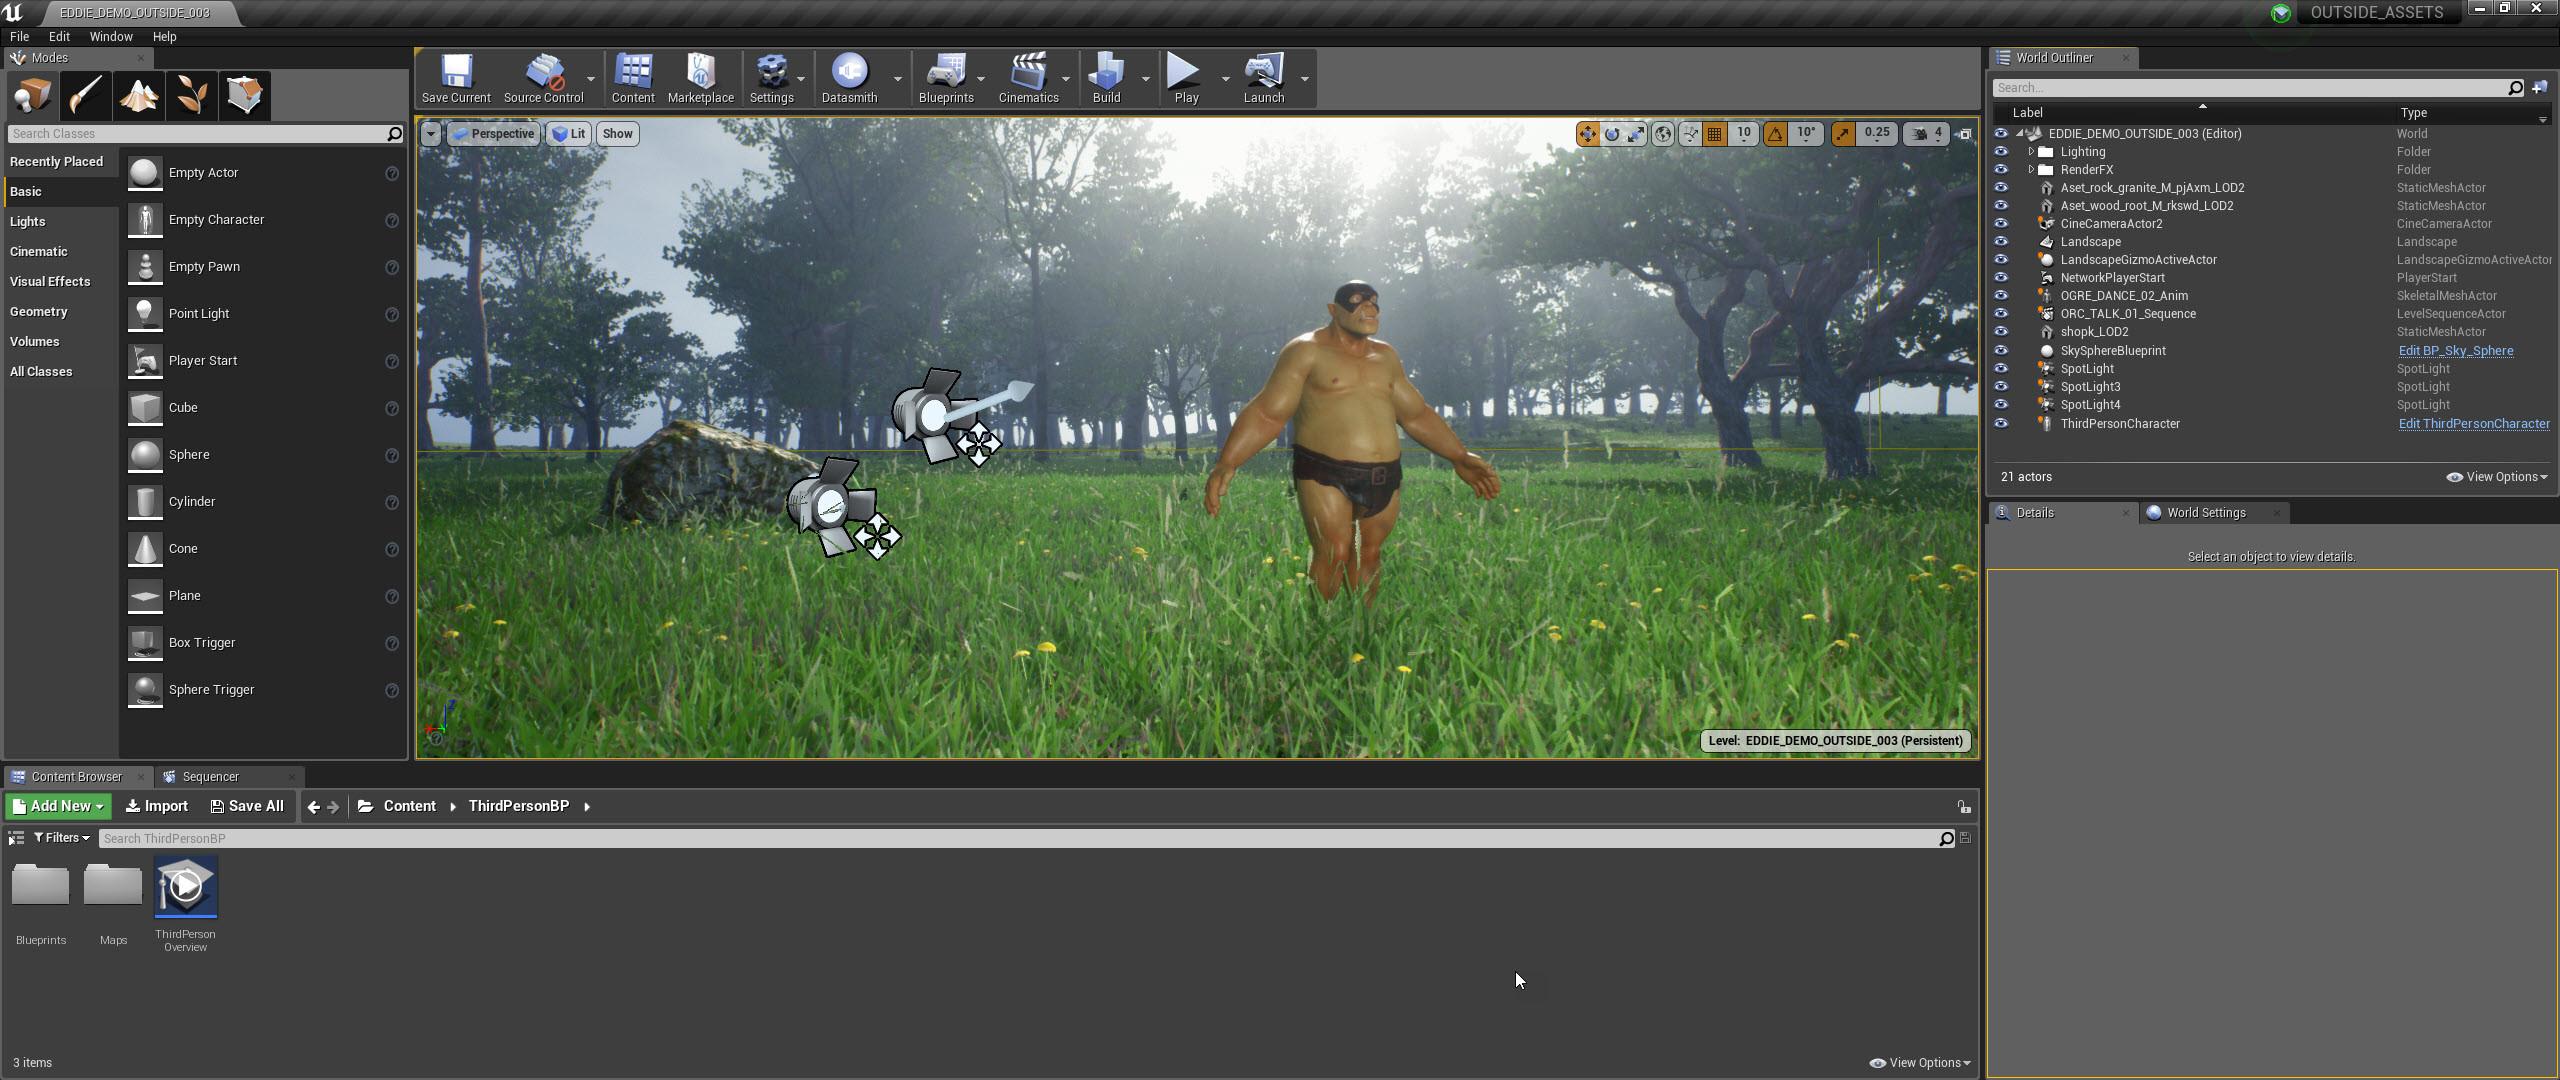 Scene in the Unreal Engine